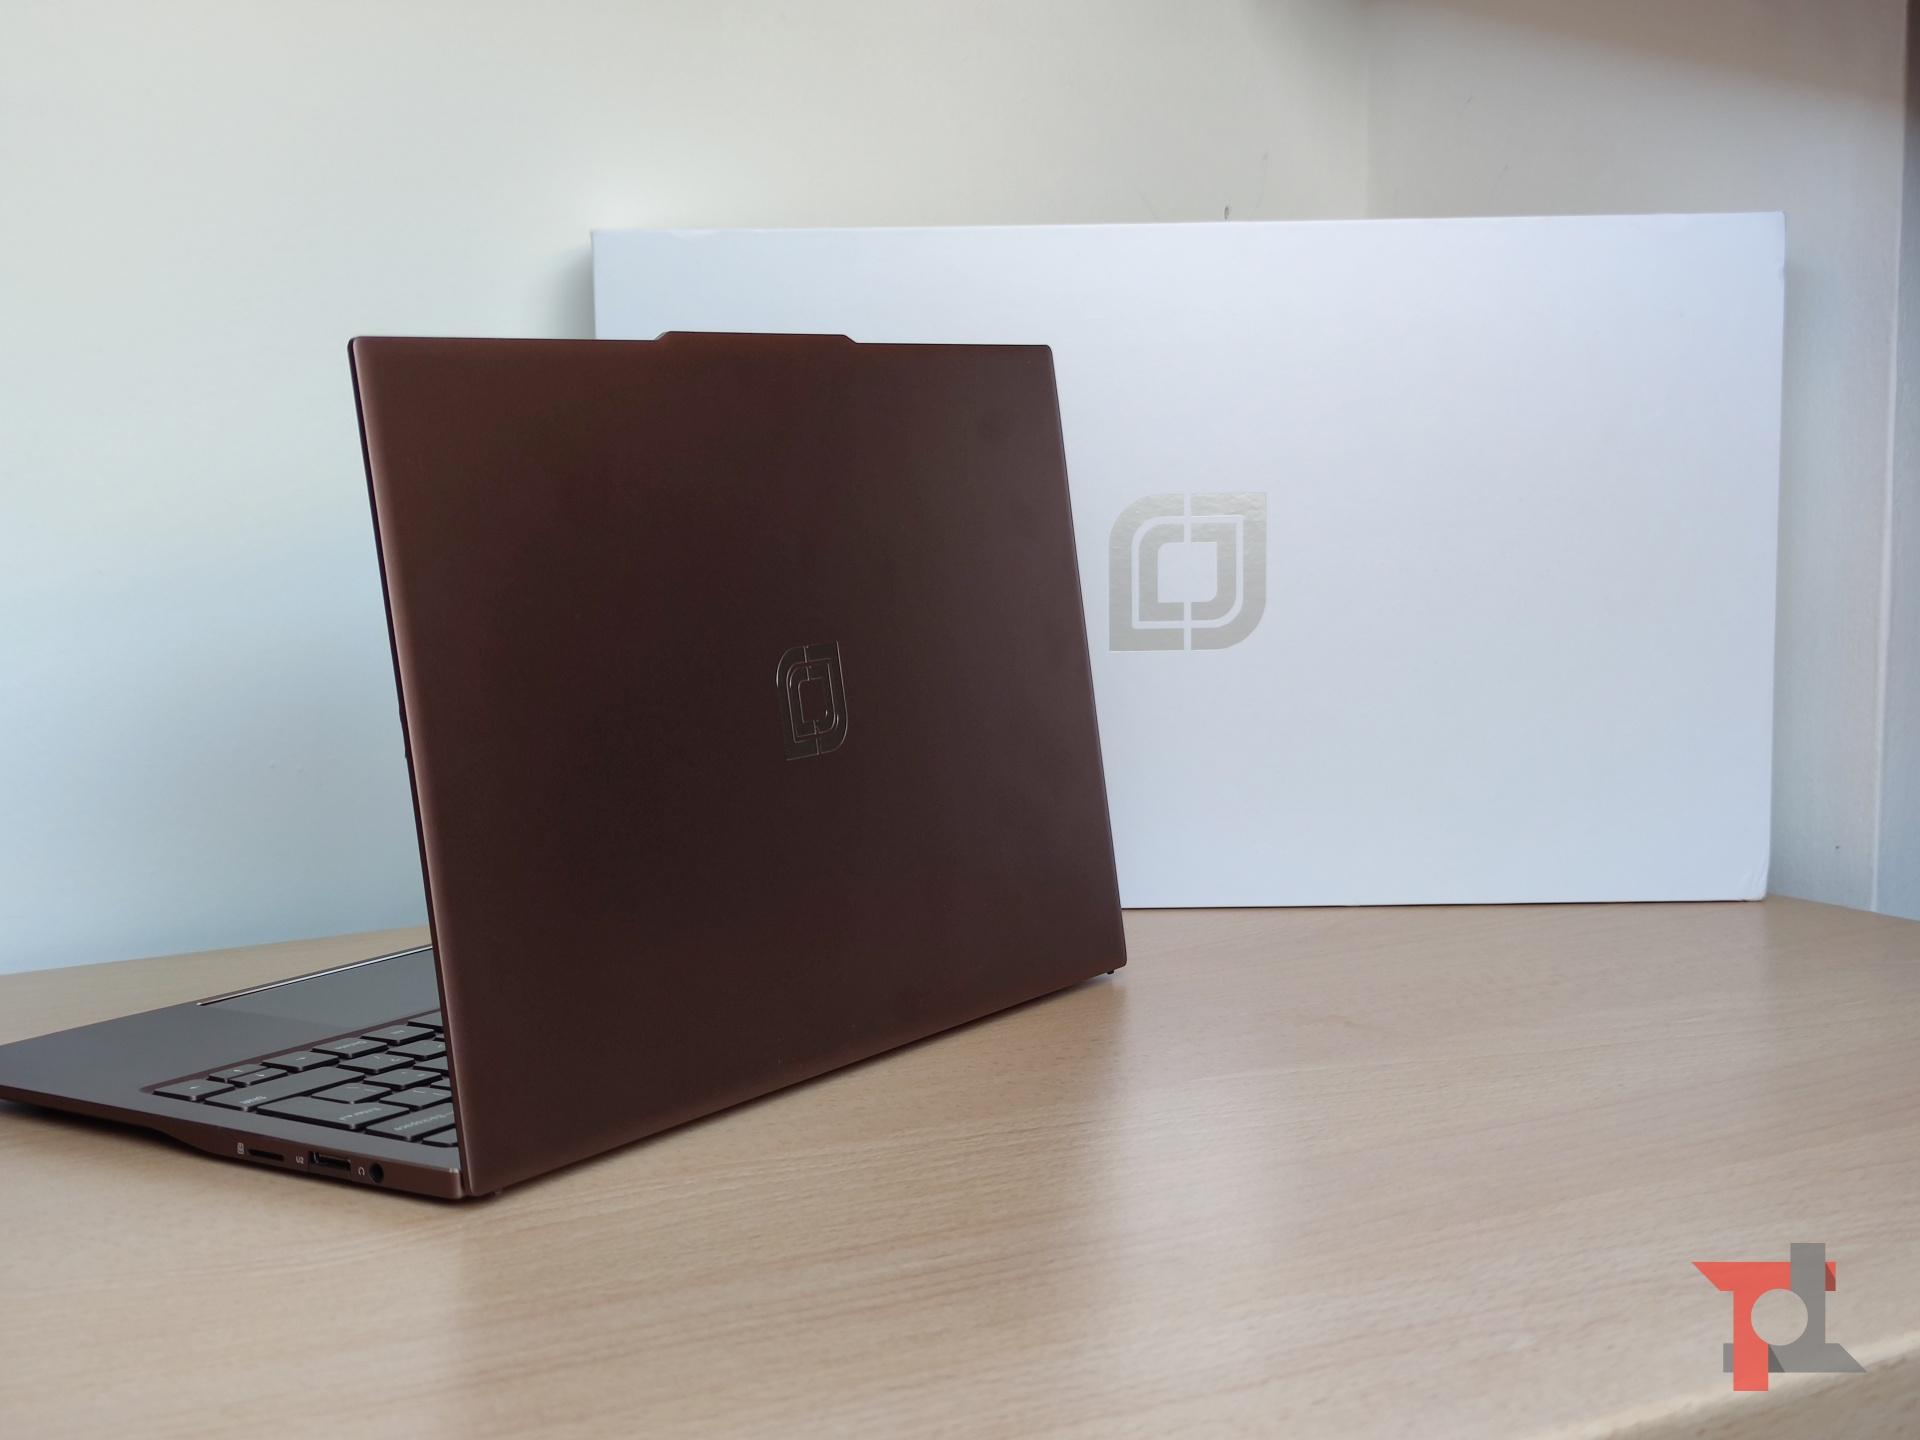 Recensione Jumper EZBook X3 Air, look premium a basso costo 1